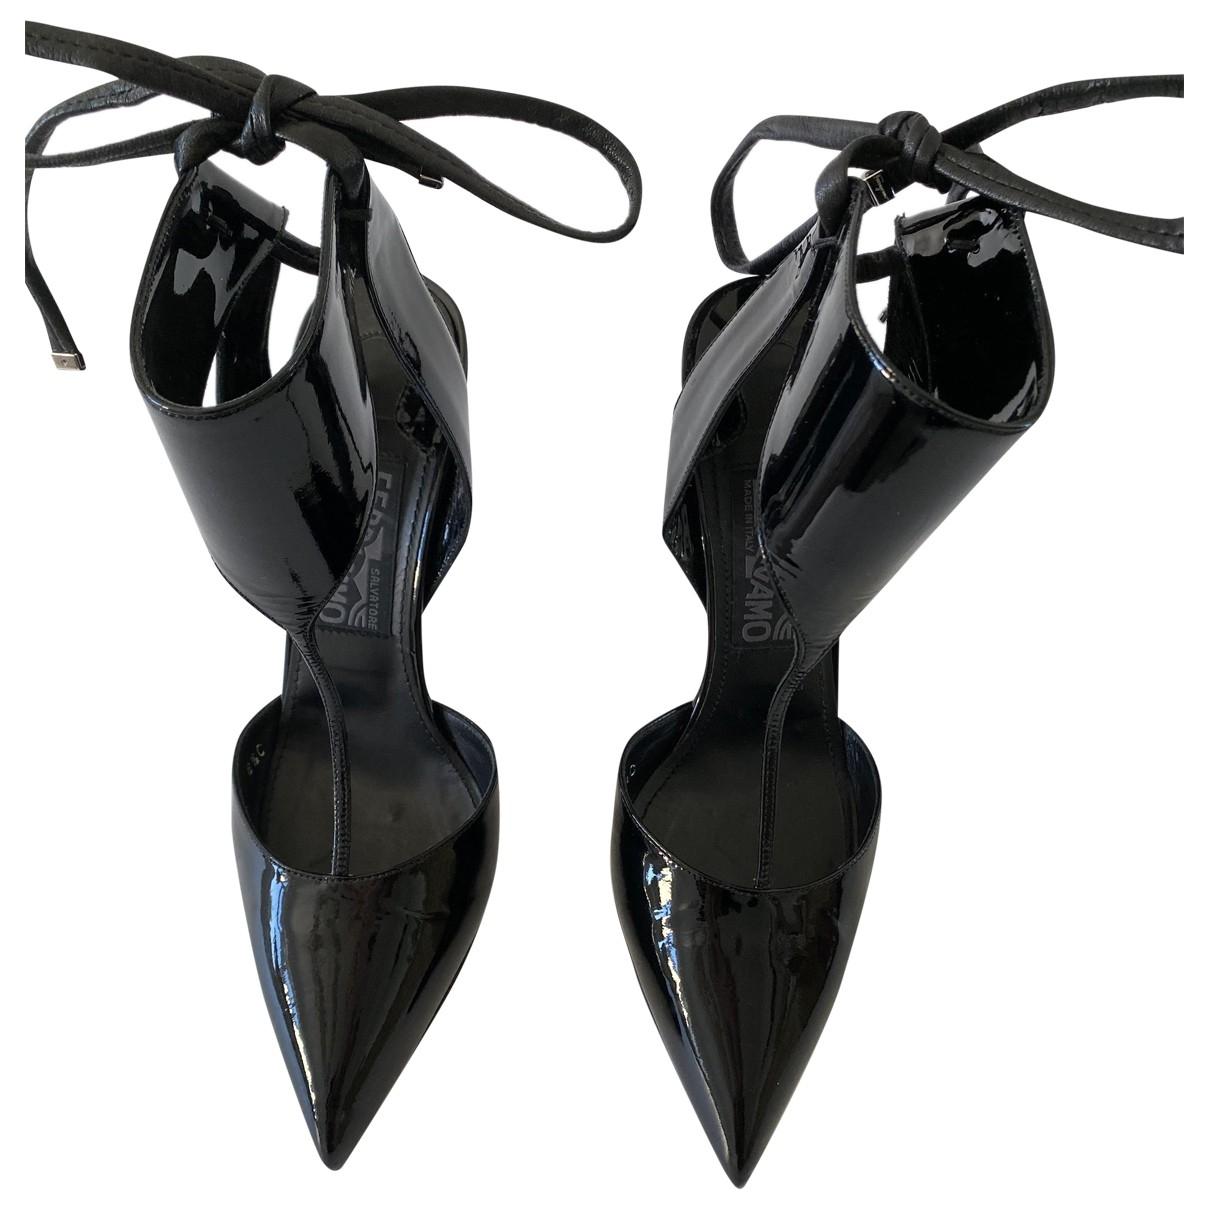 Salvatore Ferragamo \N Black Patent leather Sandals for Women 6.5 UK